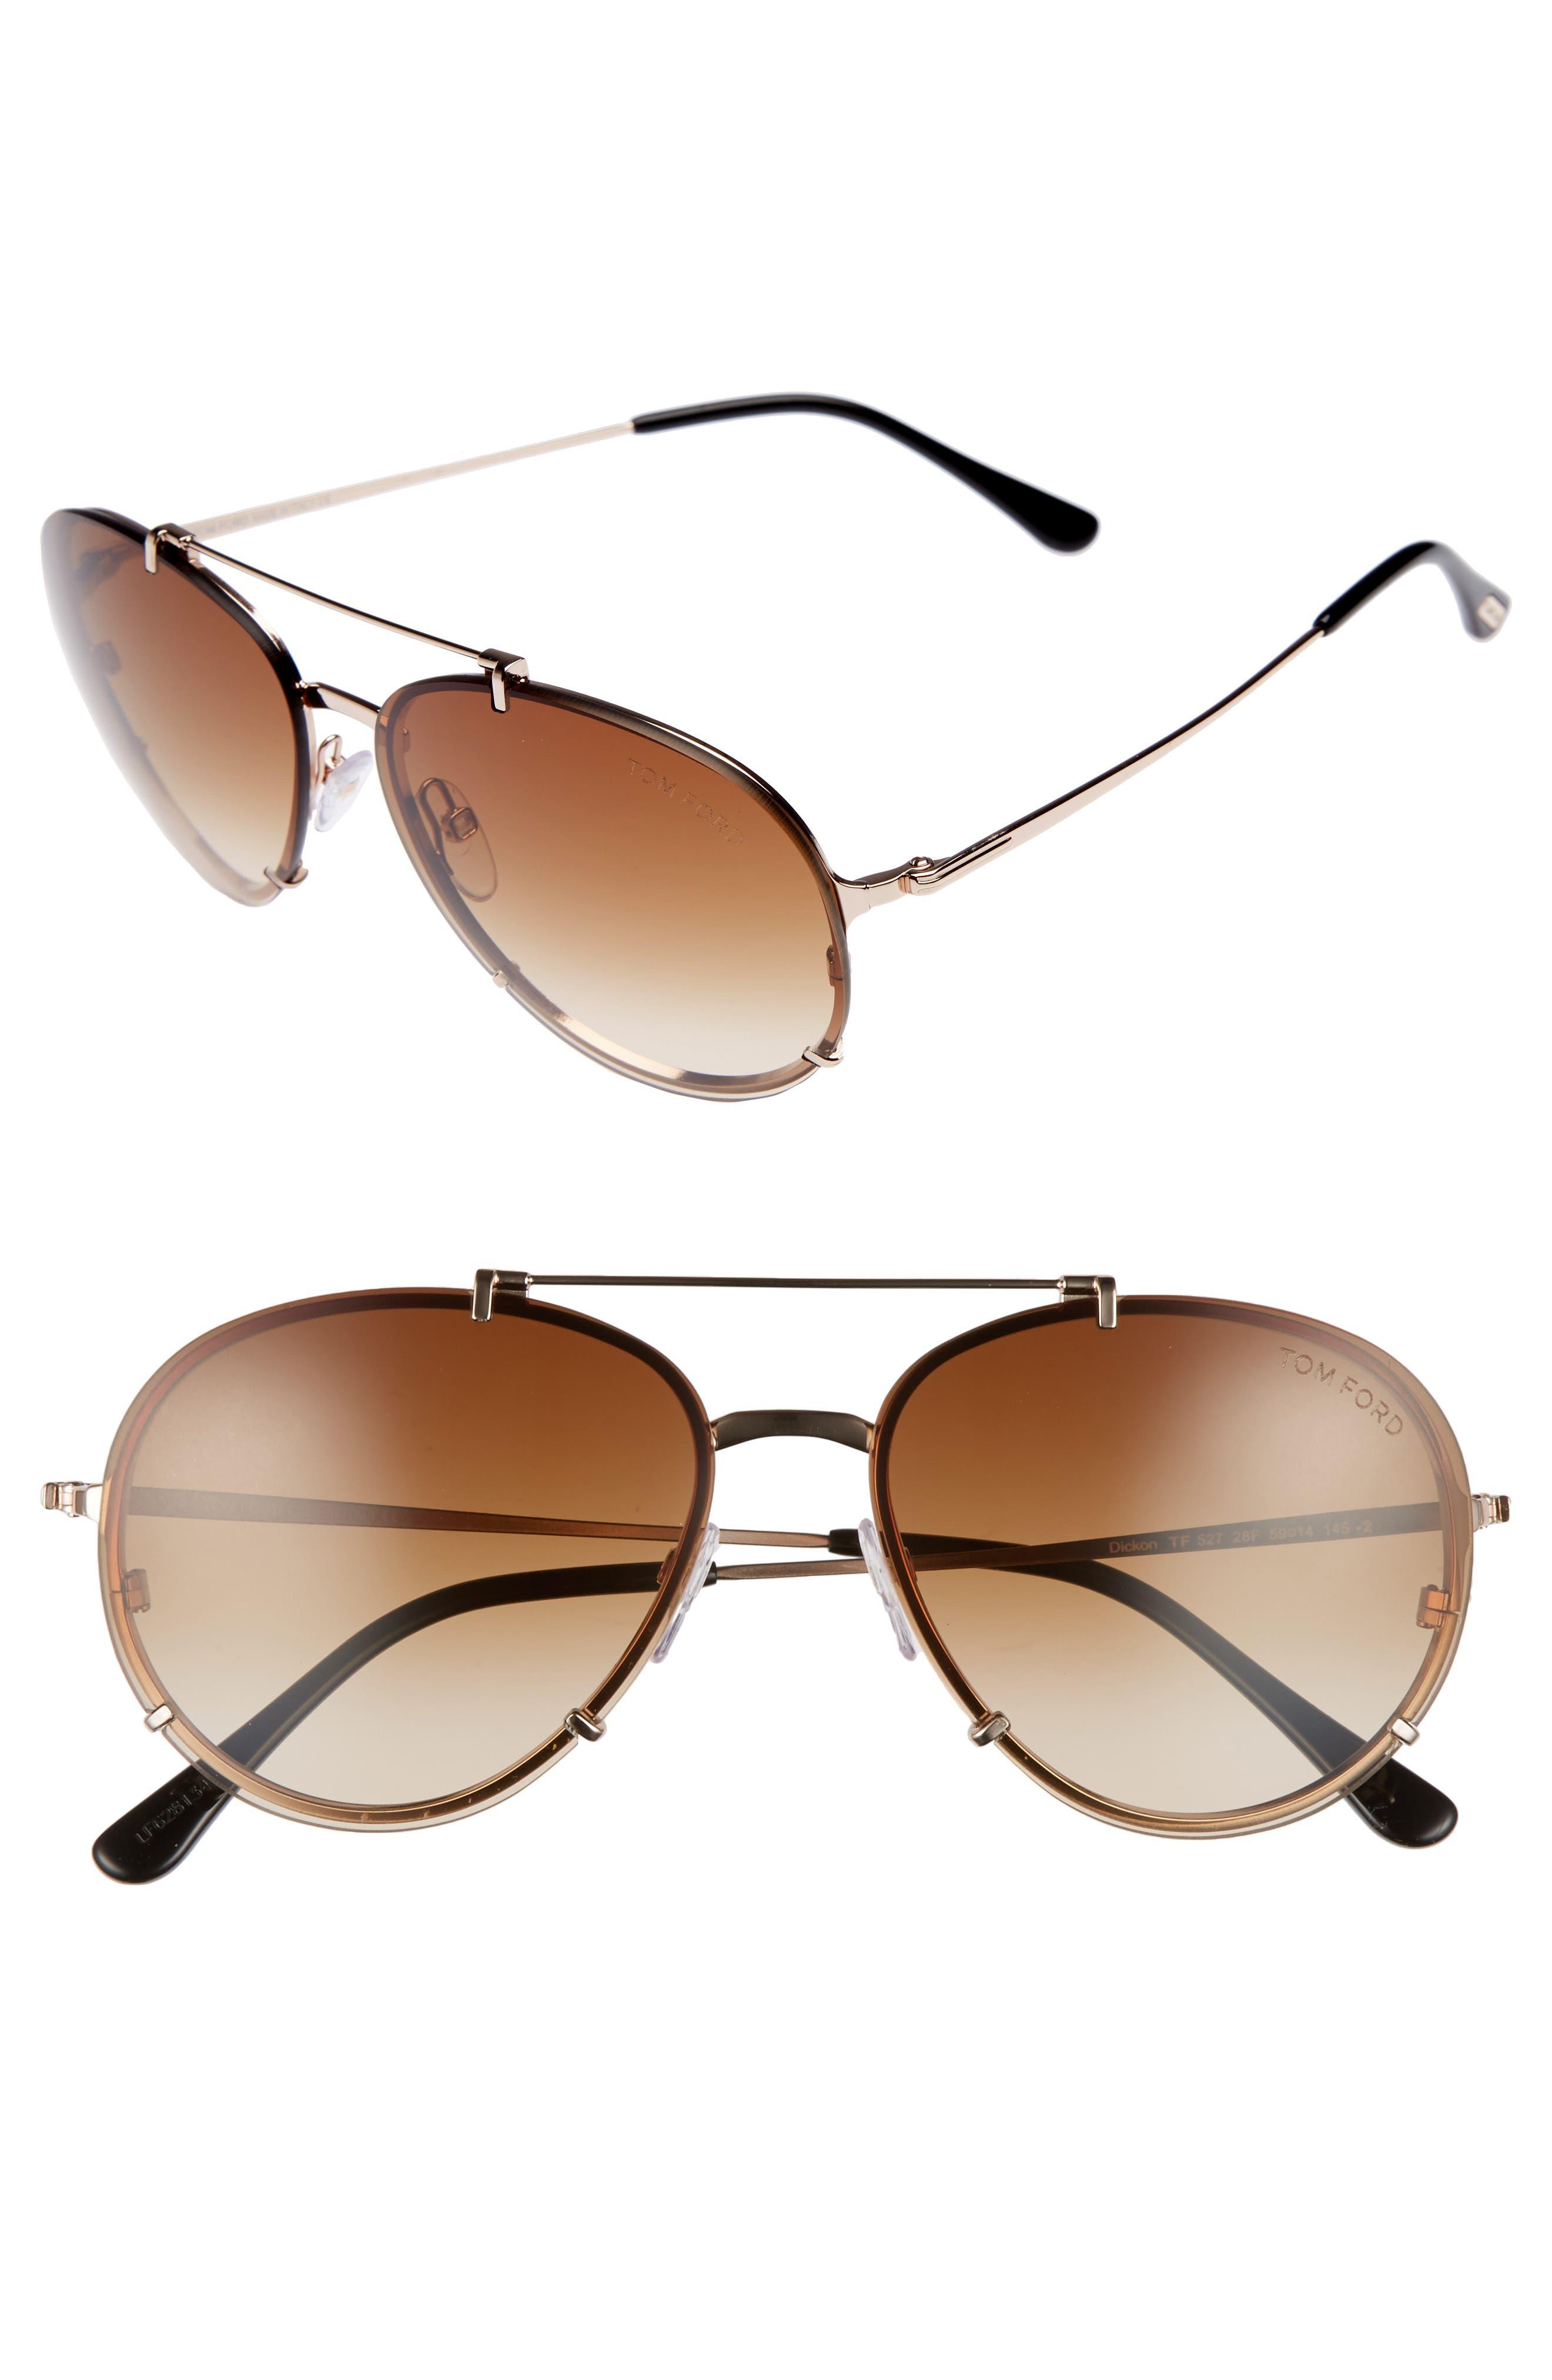 Main Image - Tom Ford Dickon 59mm Aviator Sunglasses